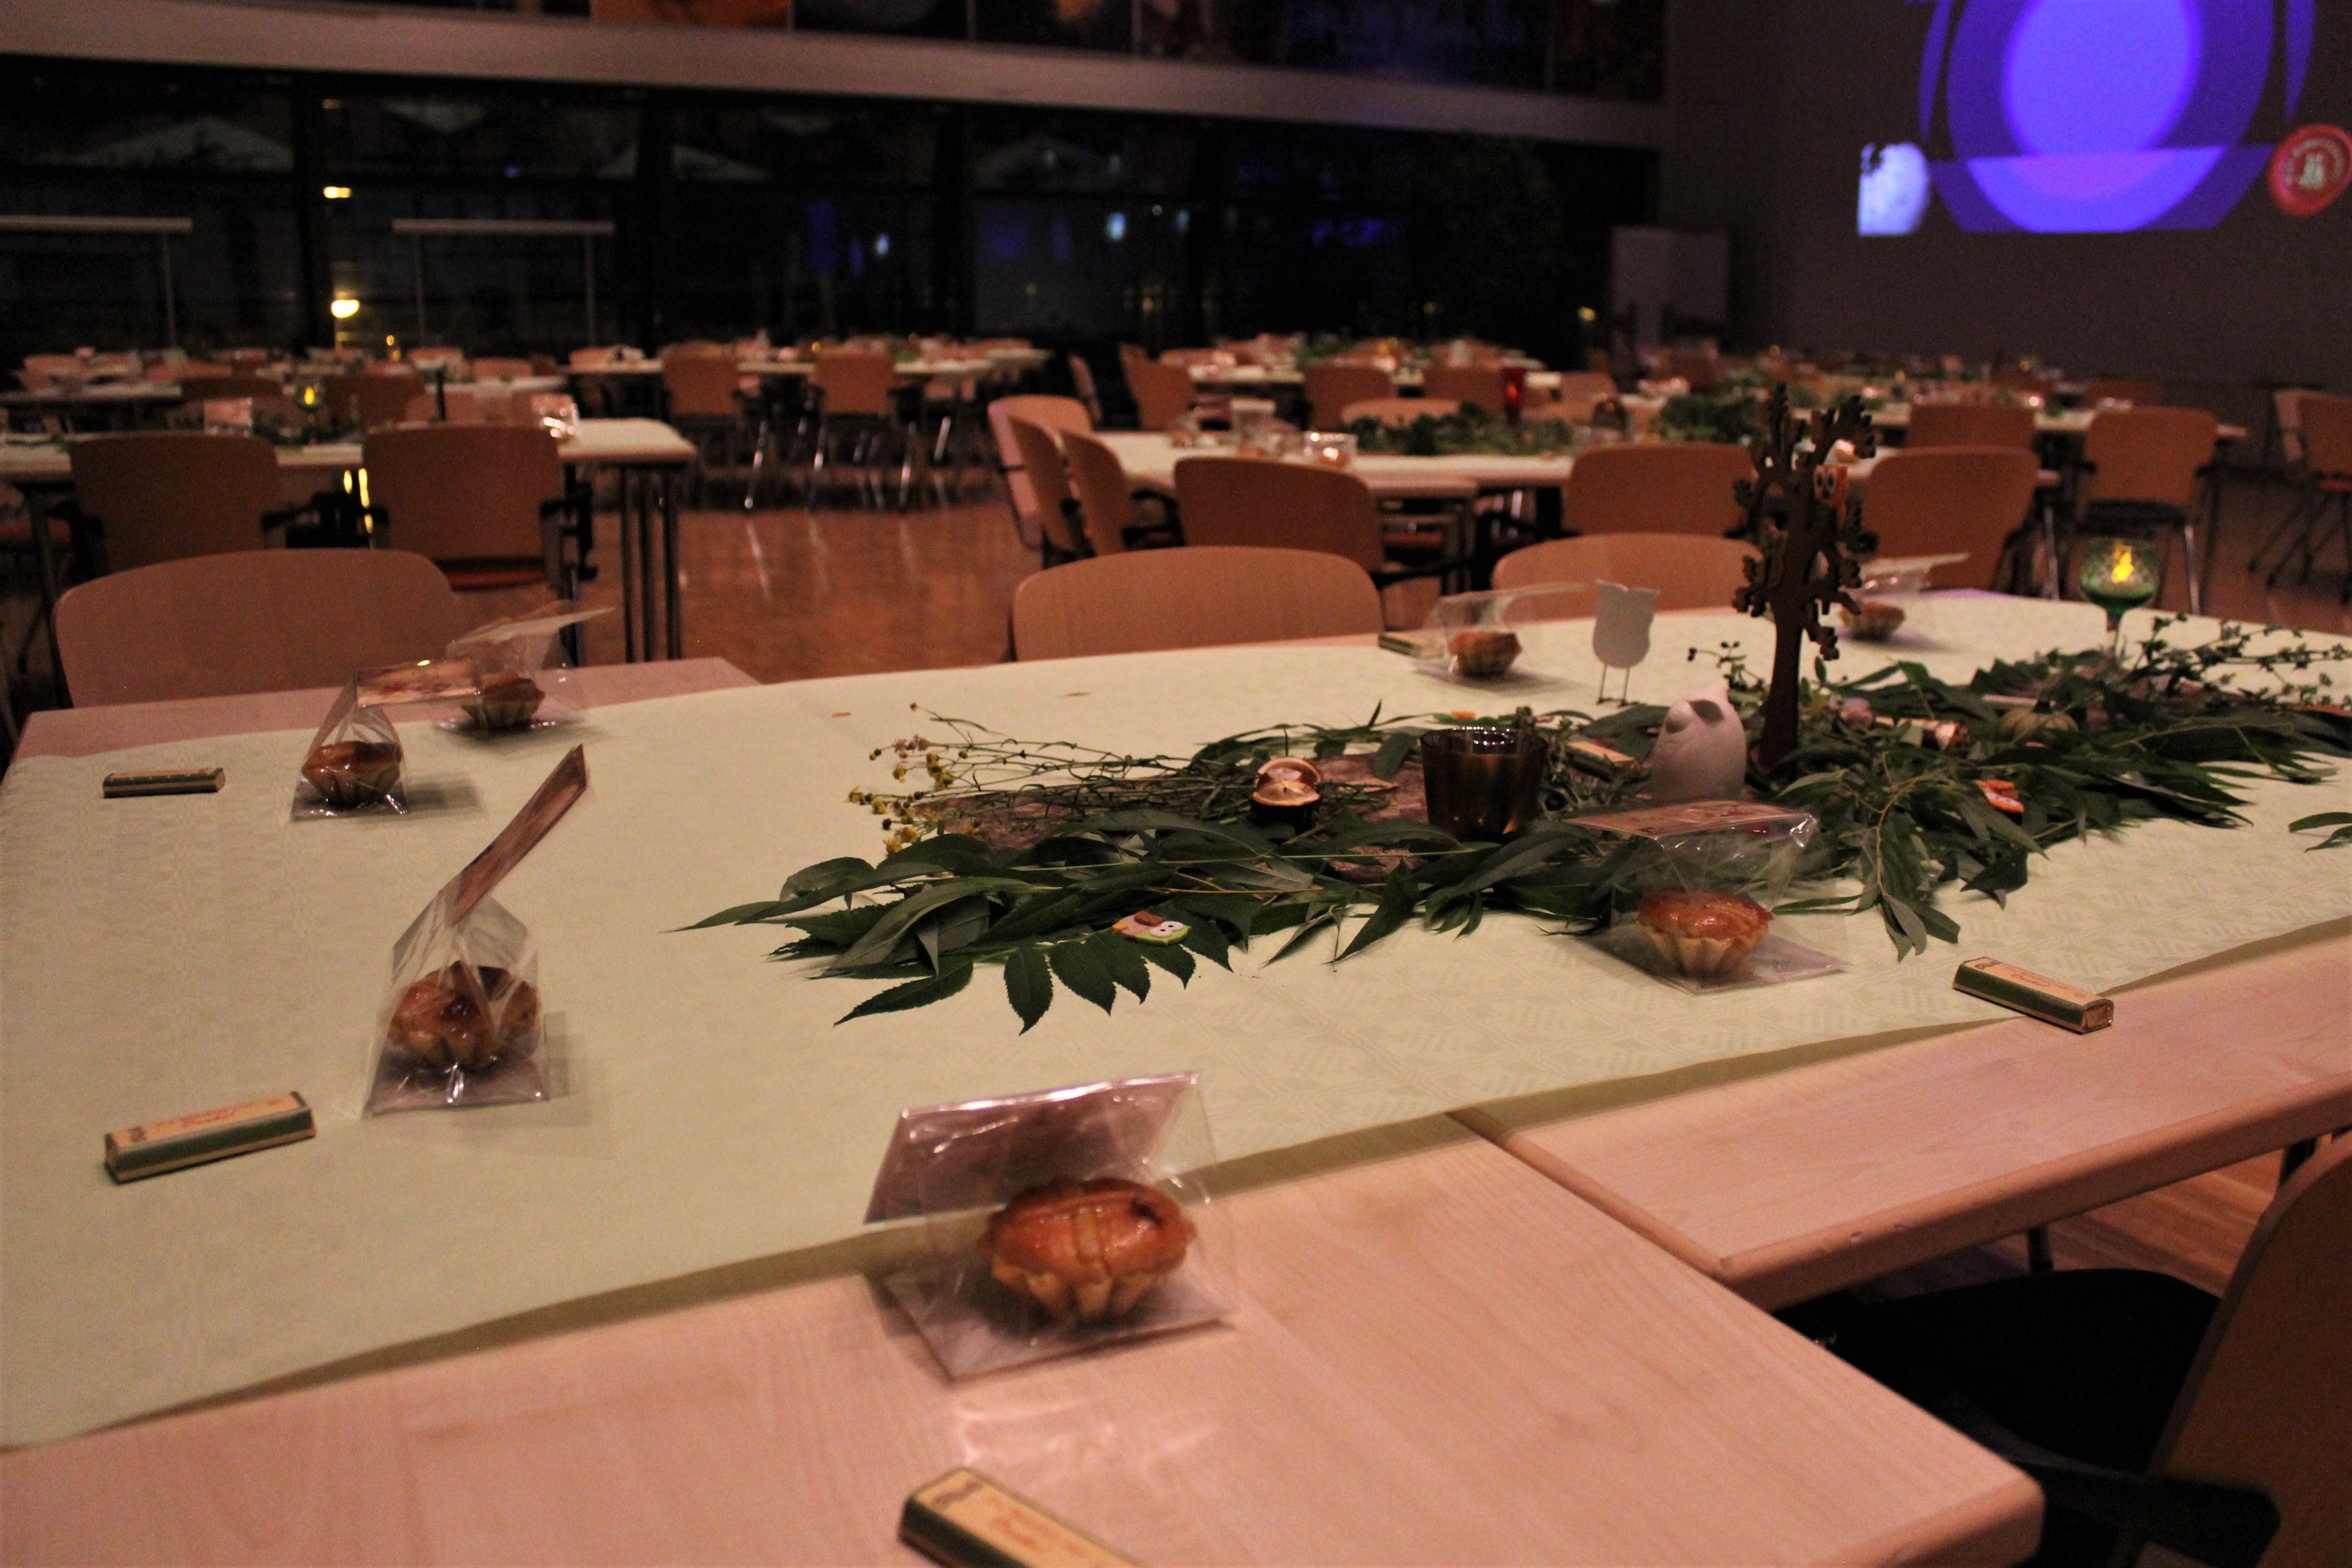 File Eulenverleihung Tischdeko 1 Jpg Wikimedia Commons